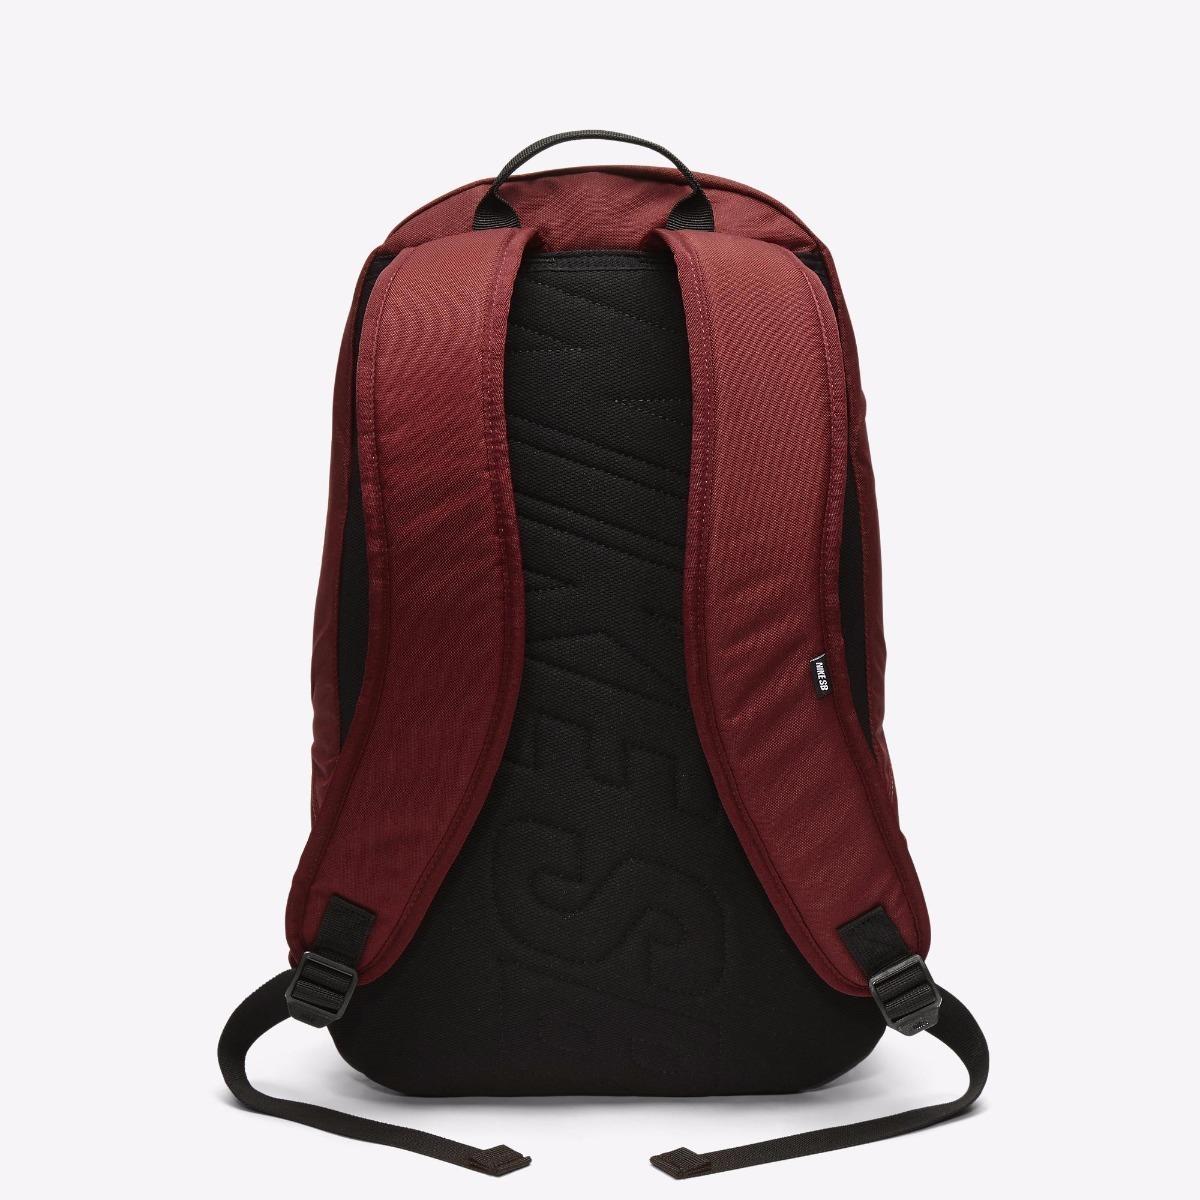 208d470f5 Mochila Nike Sb Courthouse Backpack - 100% Original - R$ 99,90 em ...